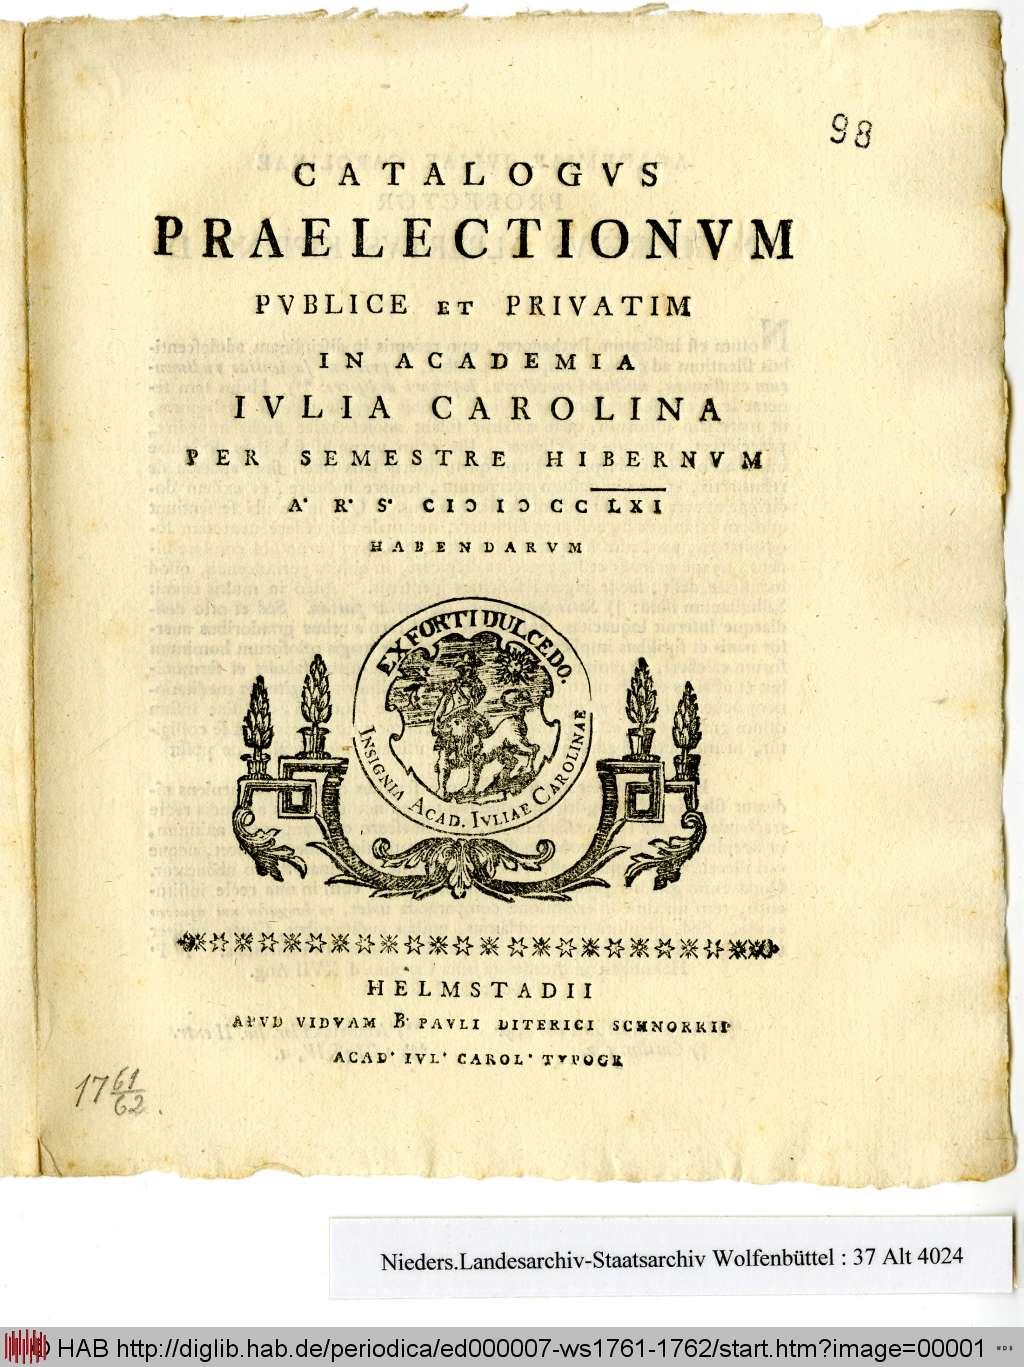 https://diglib.hab.de/periodica/ed000007-ws1761-1762/00001.jpg